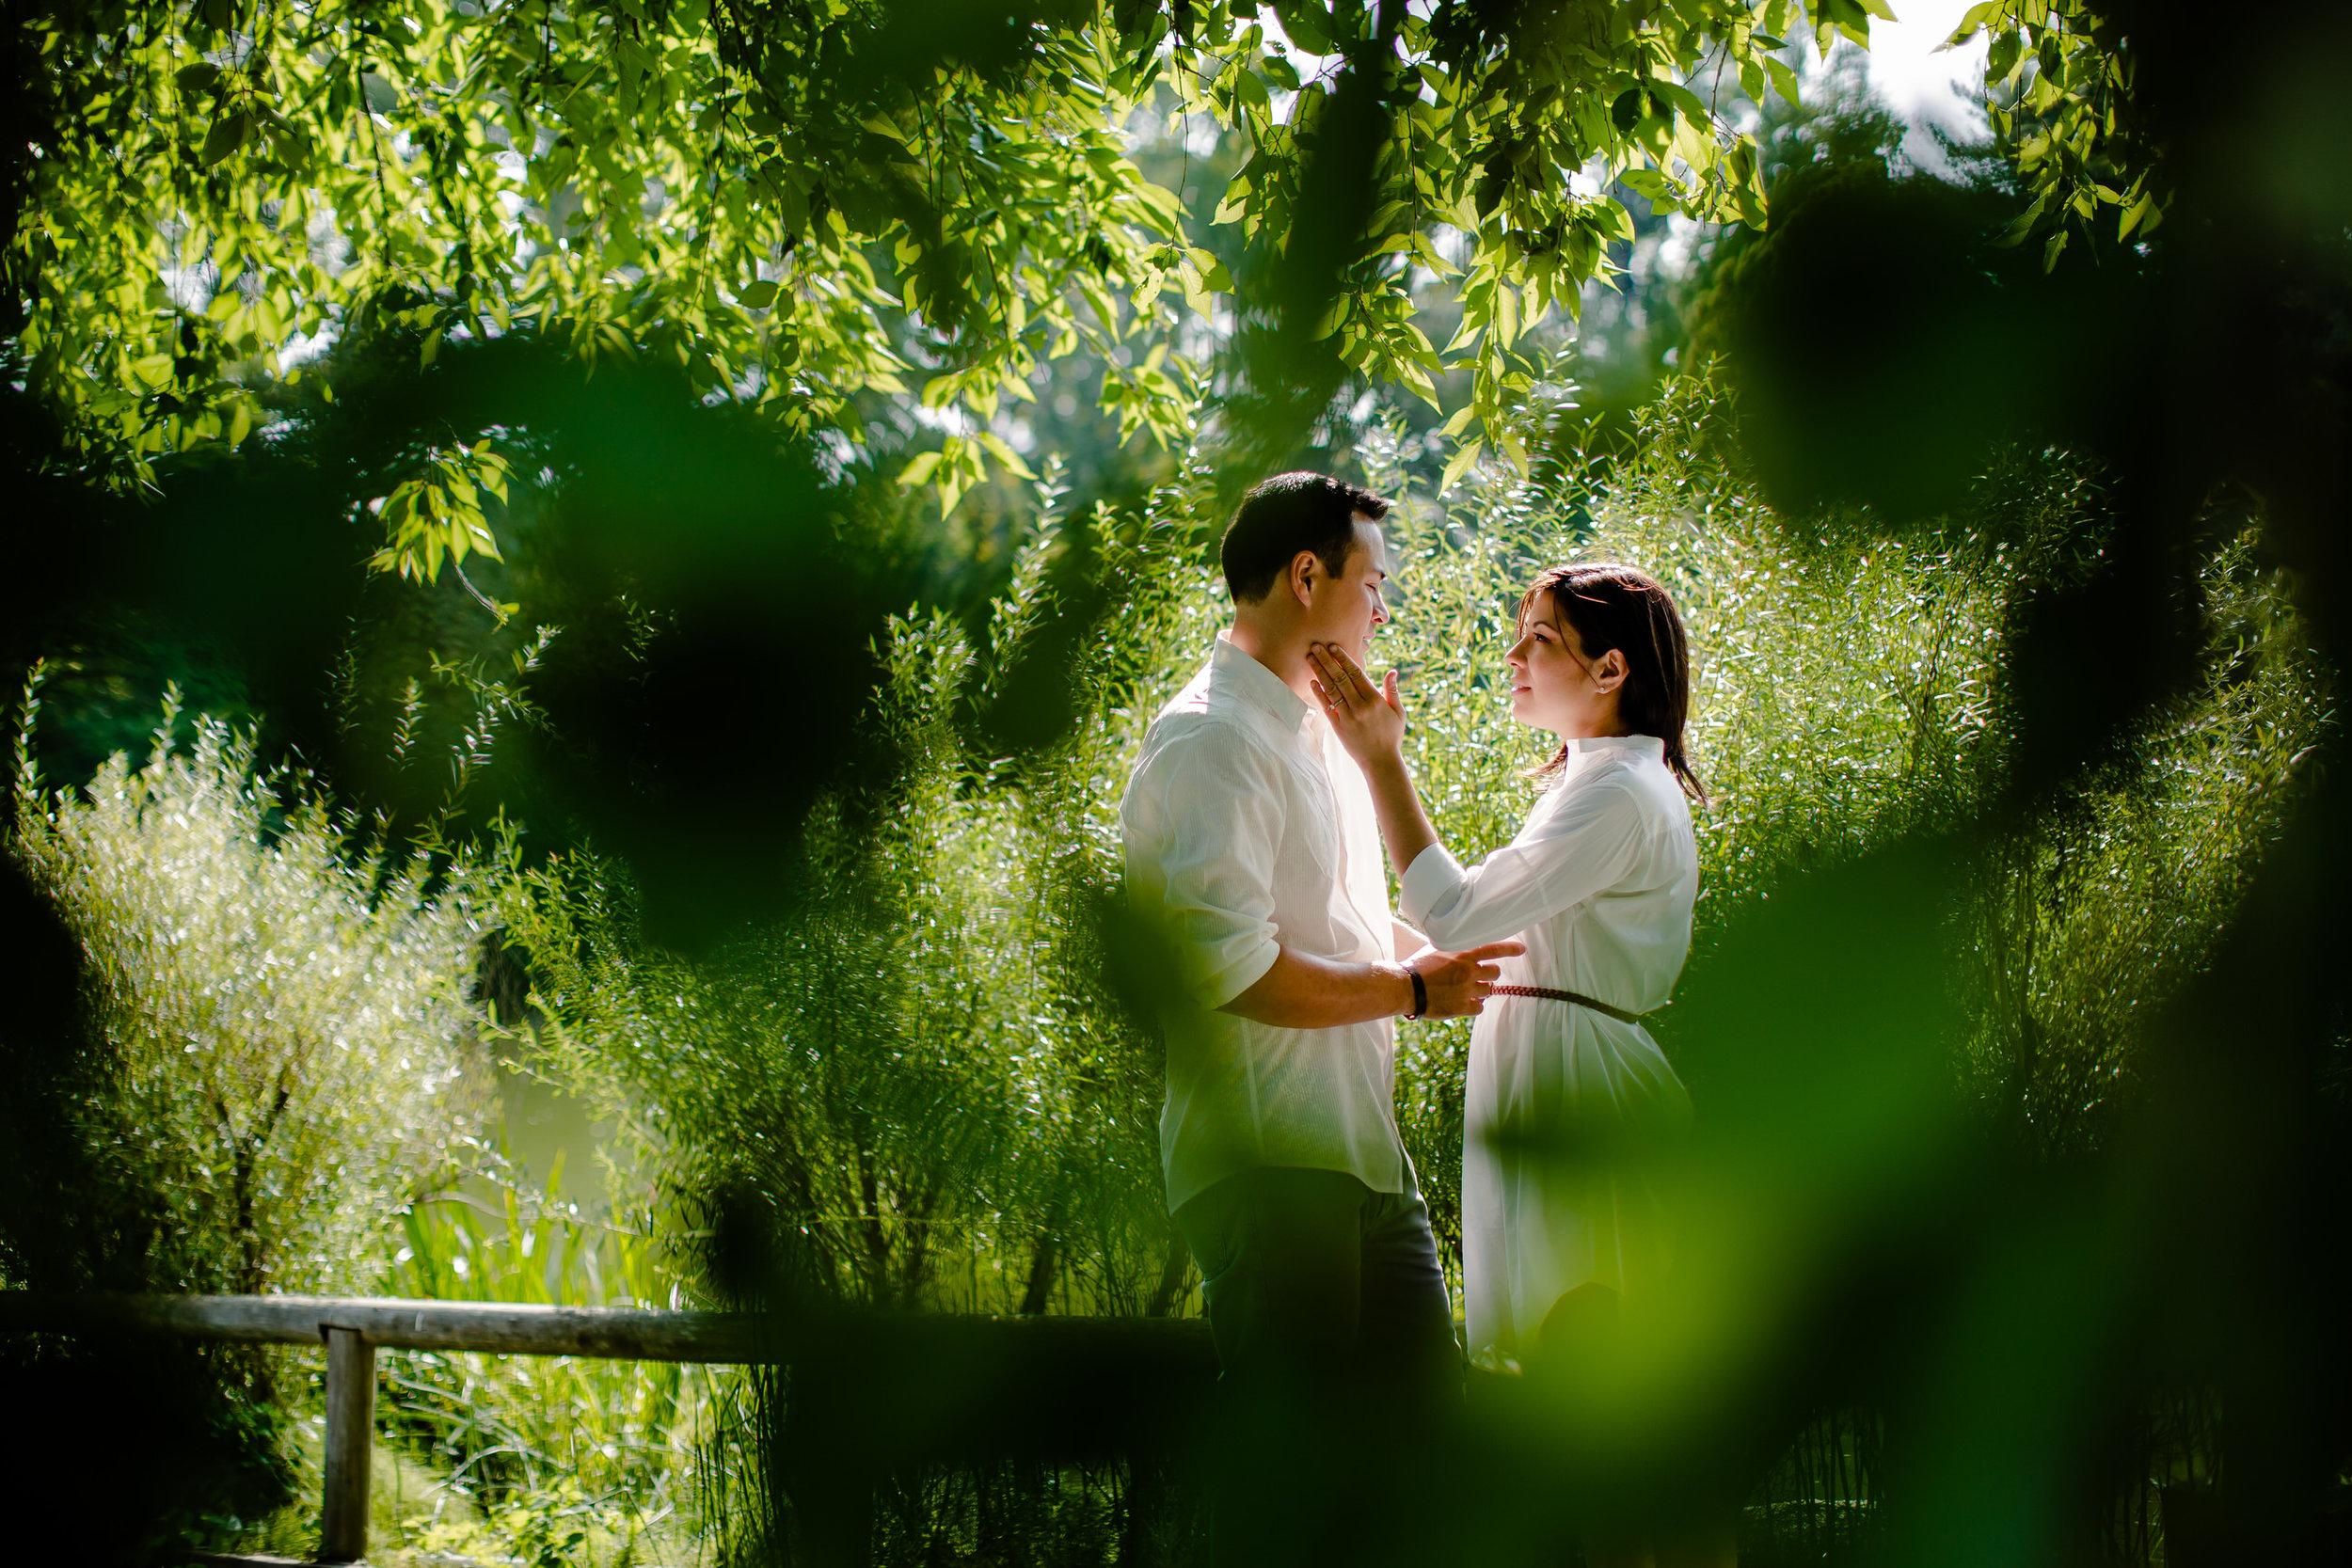 fearless_photographers_tiny_house_photo_stephanie_lynn_studios_florida_weddings_engagements.jpg